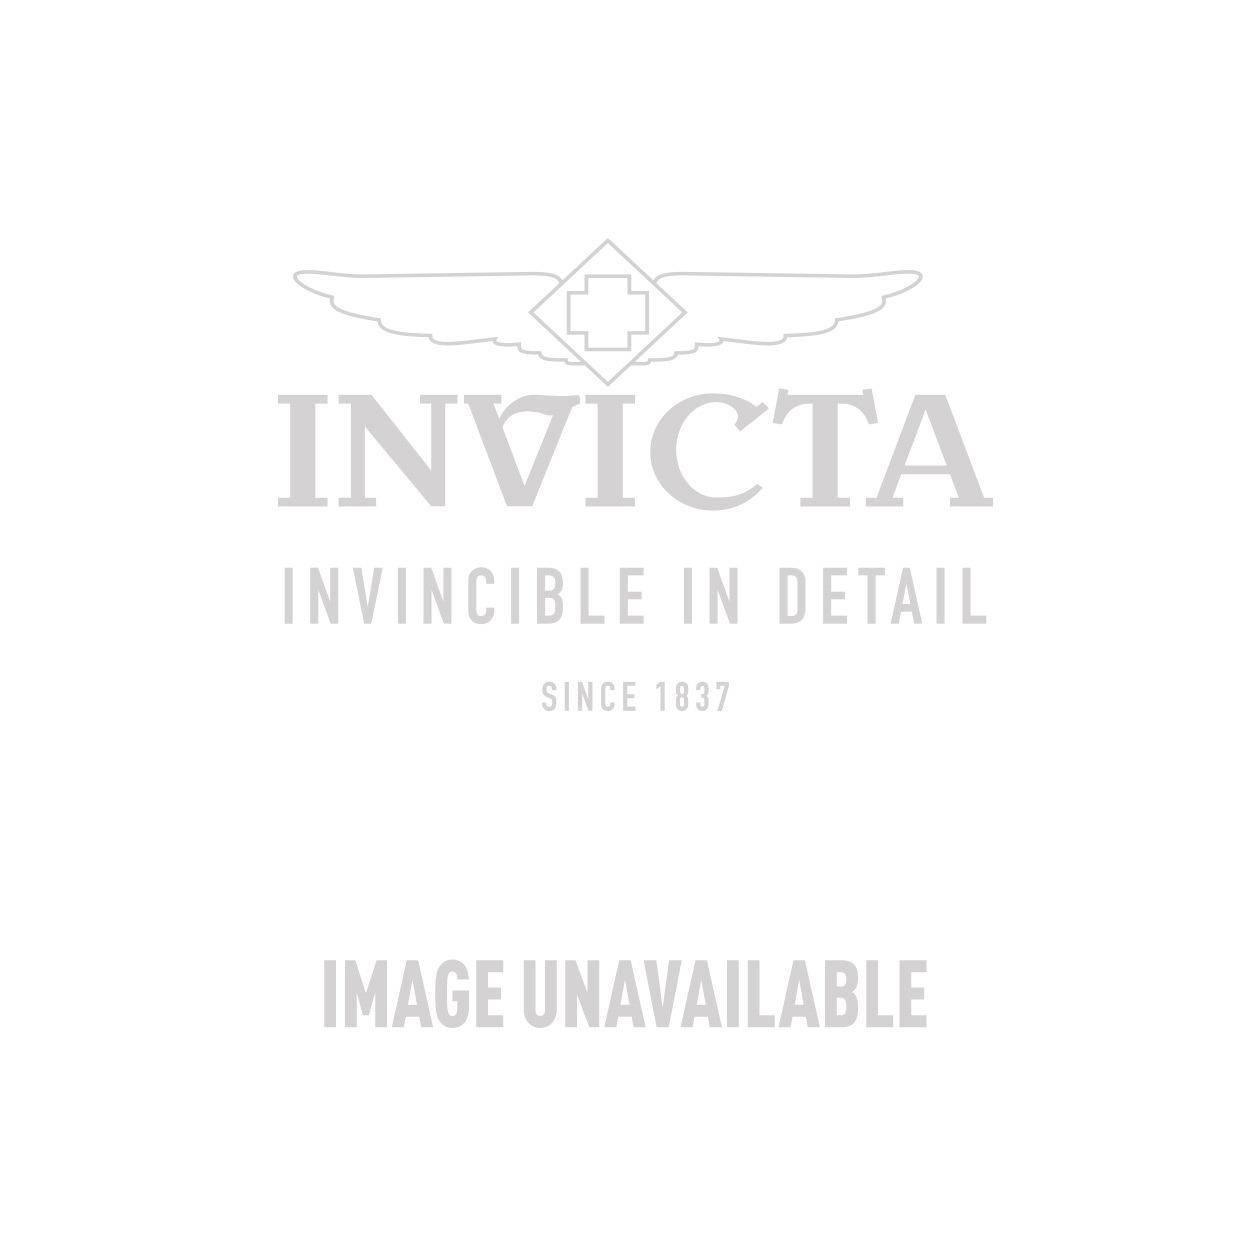 Invicta Subaqua NOMA VI Dragon Scale Mens Quartz 51.2mm Gunmetal, Black  Case Stainless Steel Dial Model - 21675